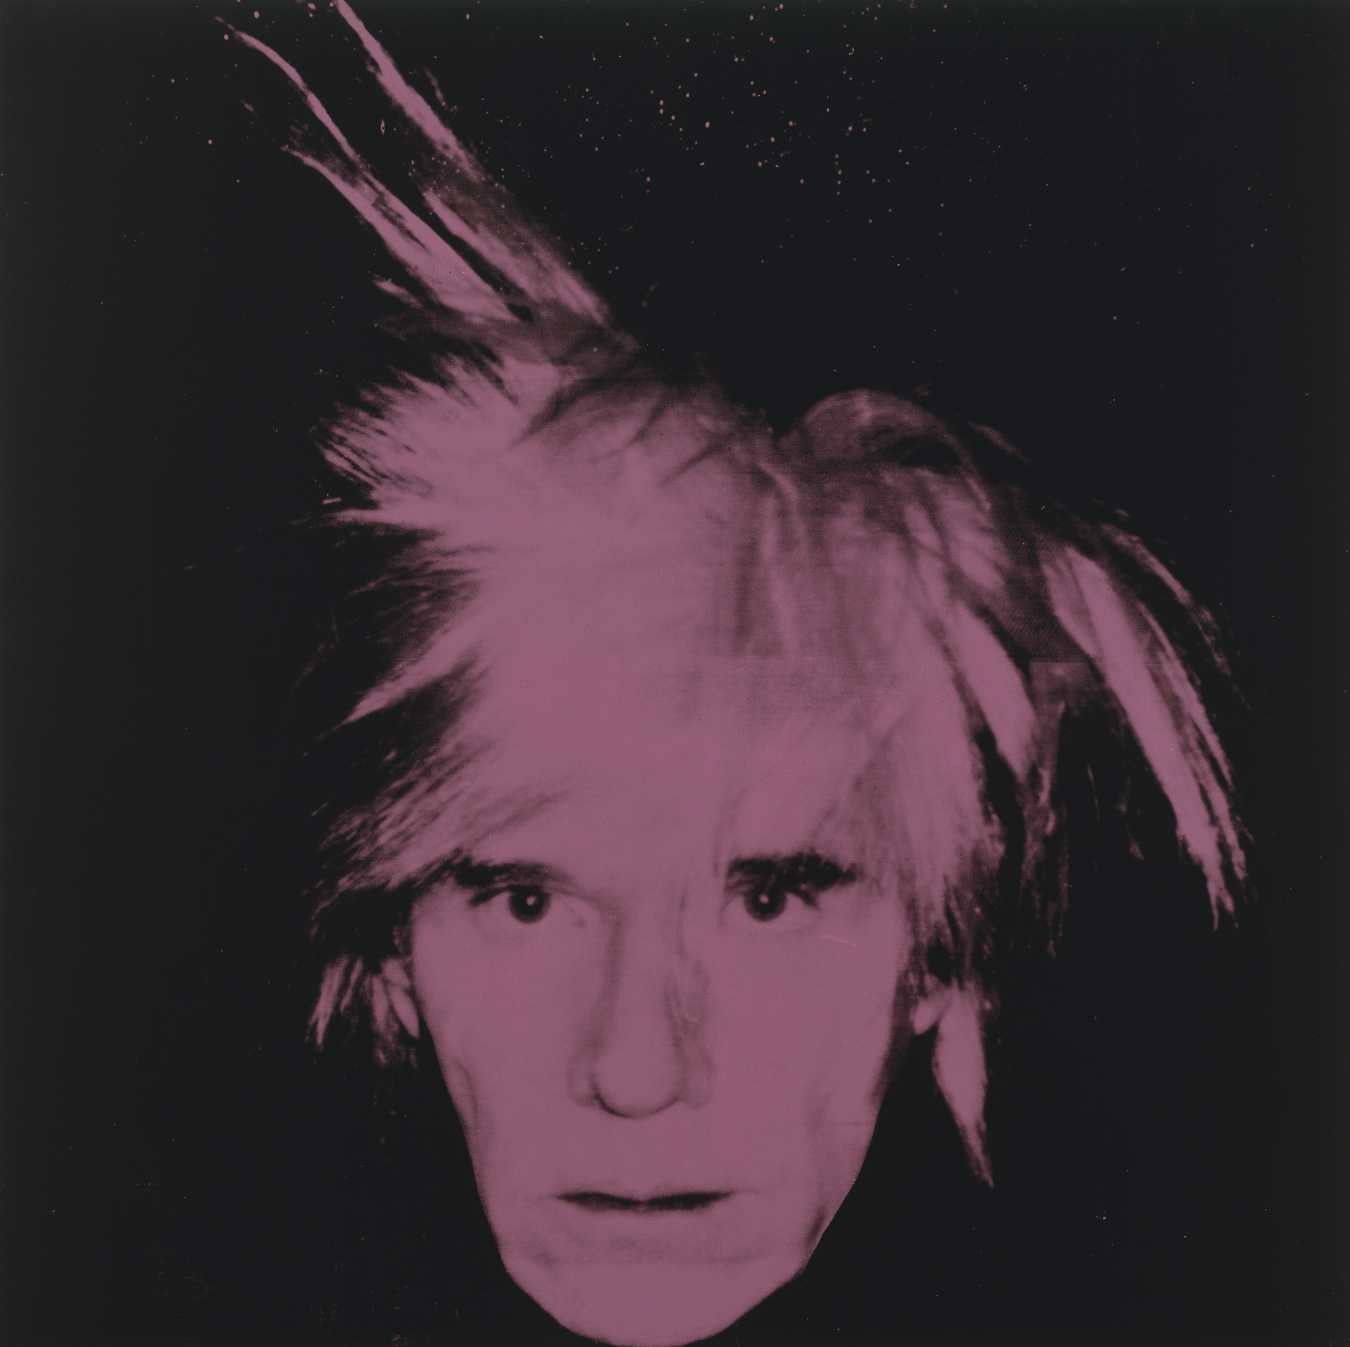 Warhol Self-Portrait